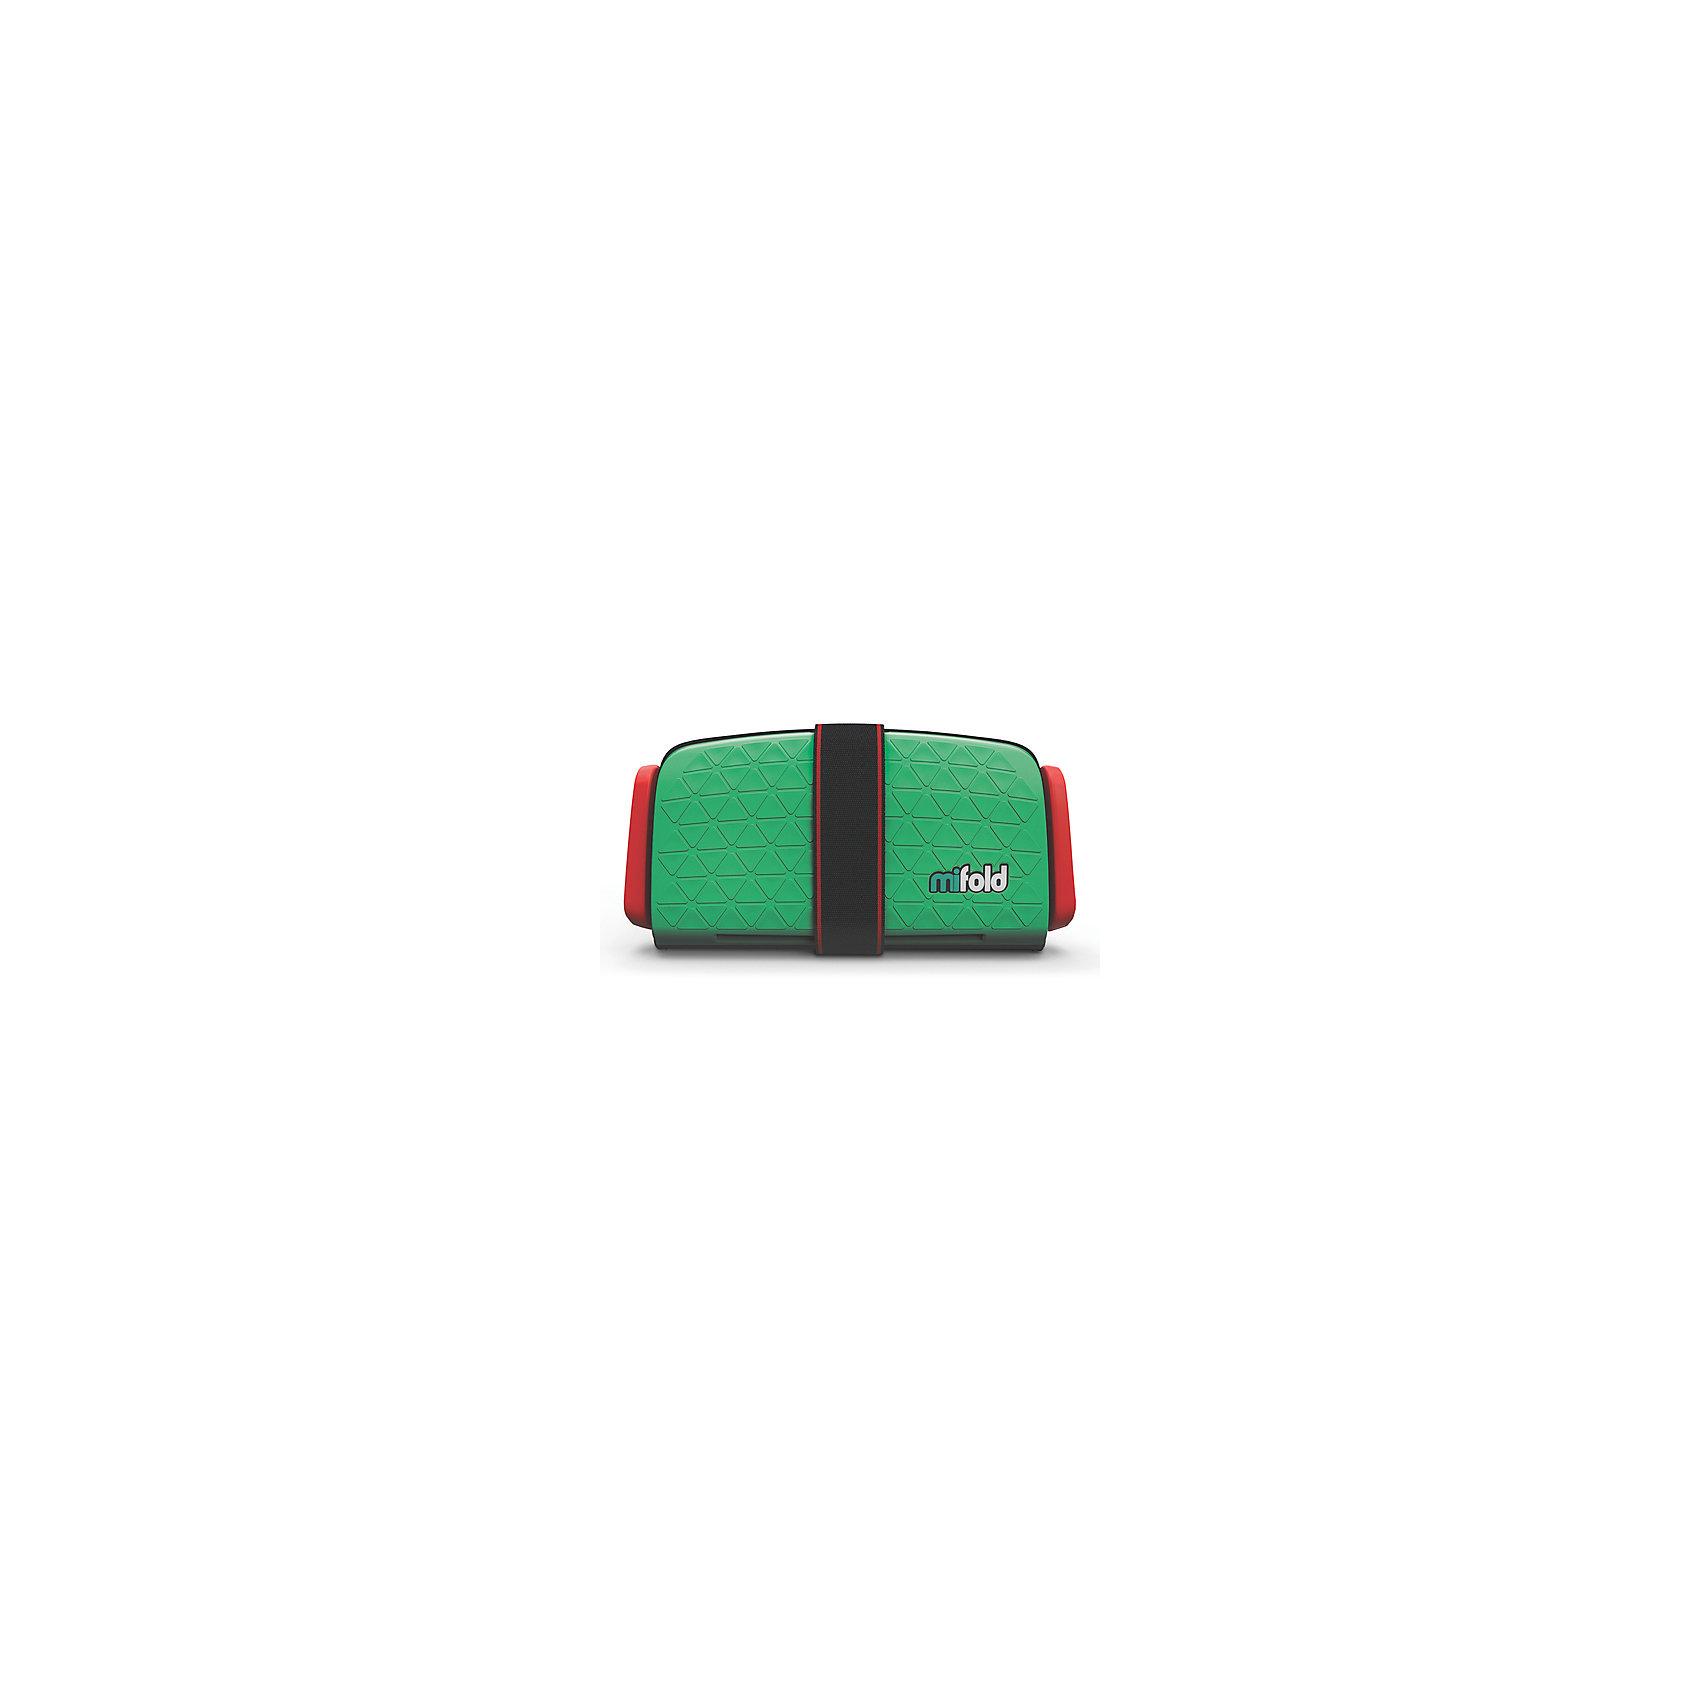 Автокресло-бустер Mifold 15-36 кг, lime greenБустеры<br>Бустер автомобильный Mifold - the Grab-and-Go Booster seat/Lime Green<br><br>Ширина мм: 166<br>Глубина мм: 251<br>Высота мм: 71<br>Вес г: 950<br>Цвет: зеленый<br>Возраст от месяцев: 48<br>Возраст до месяцев: 144<br>Пол: Унисекс<br>Возраст: Детский<br>SKU: 6878753